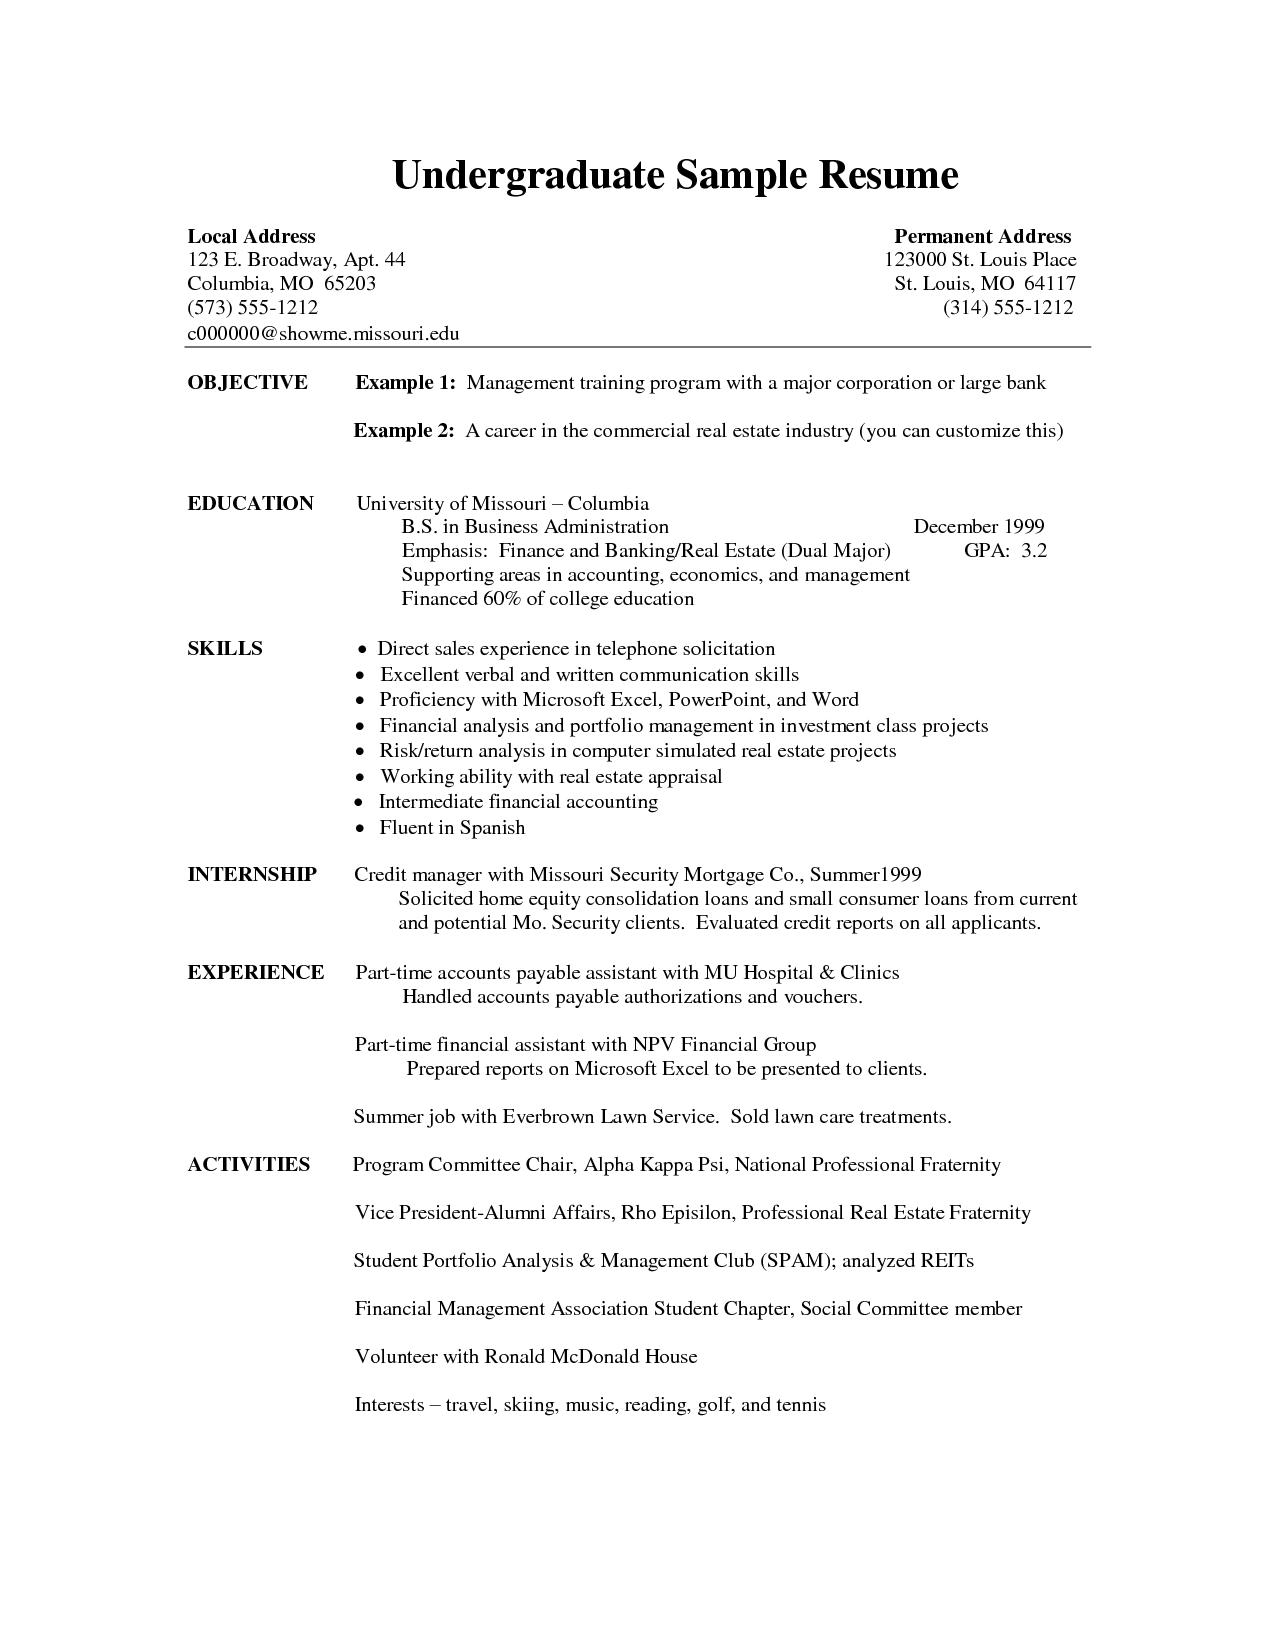 Resume Format Undergraduate Resume Templates Acting Resume Good Resume Examples Student Resume